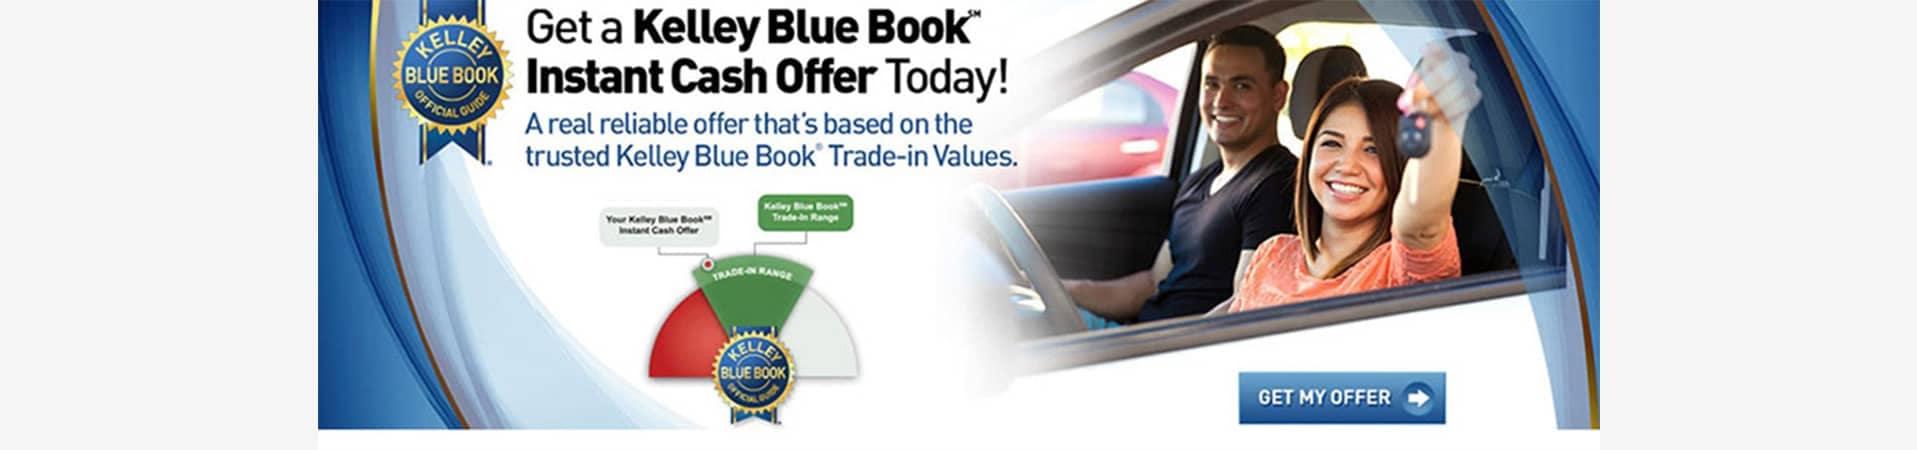 KBB Instant Cash Offer - KBB-ICO-Banner-BGf5-1917x450px